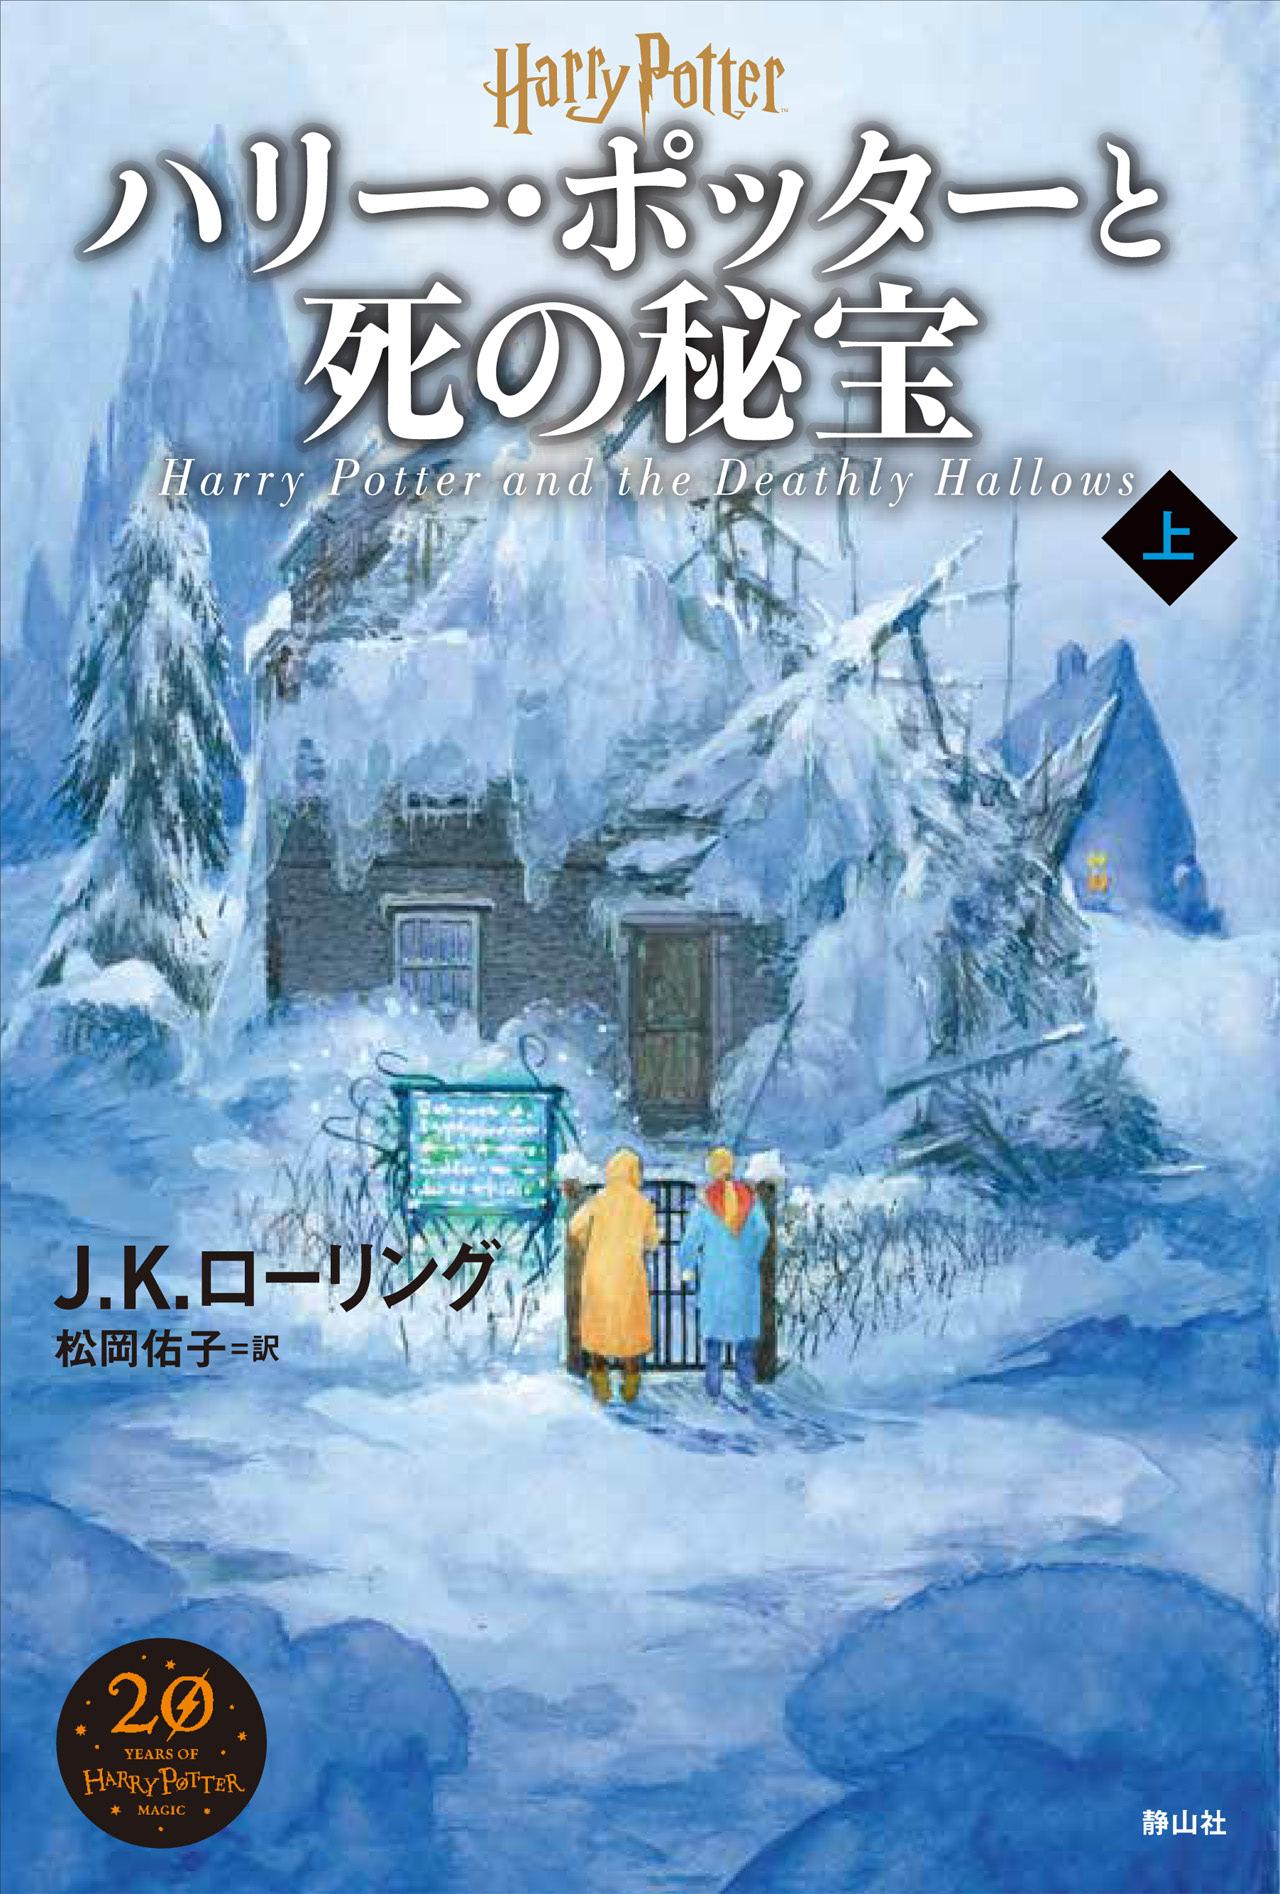 'Deathly Hallows' Japanese 20th anniversary edition (volume 1)